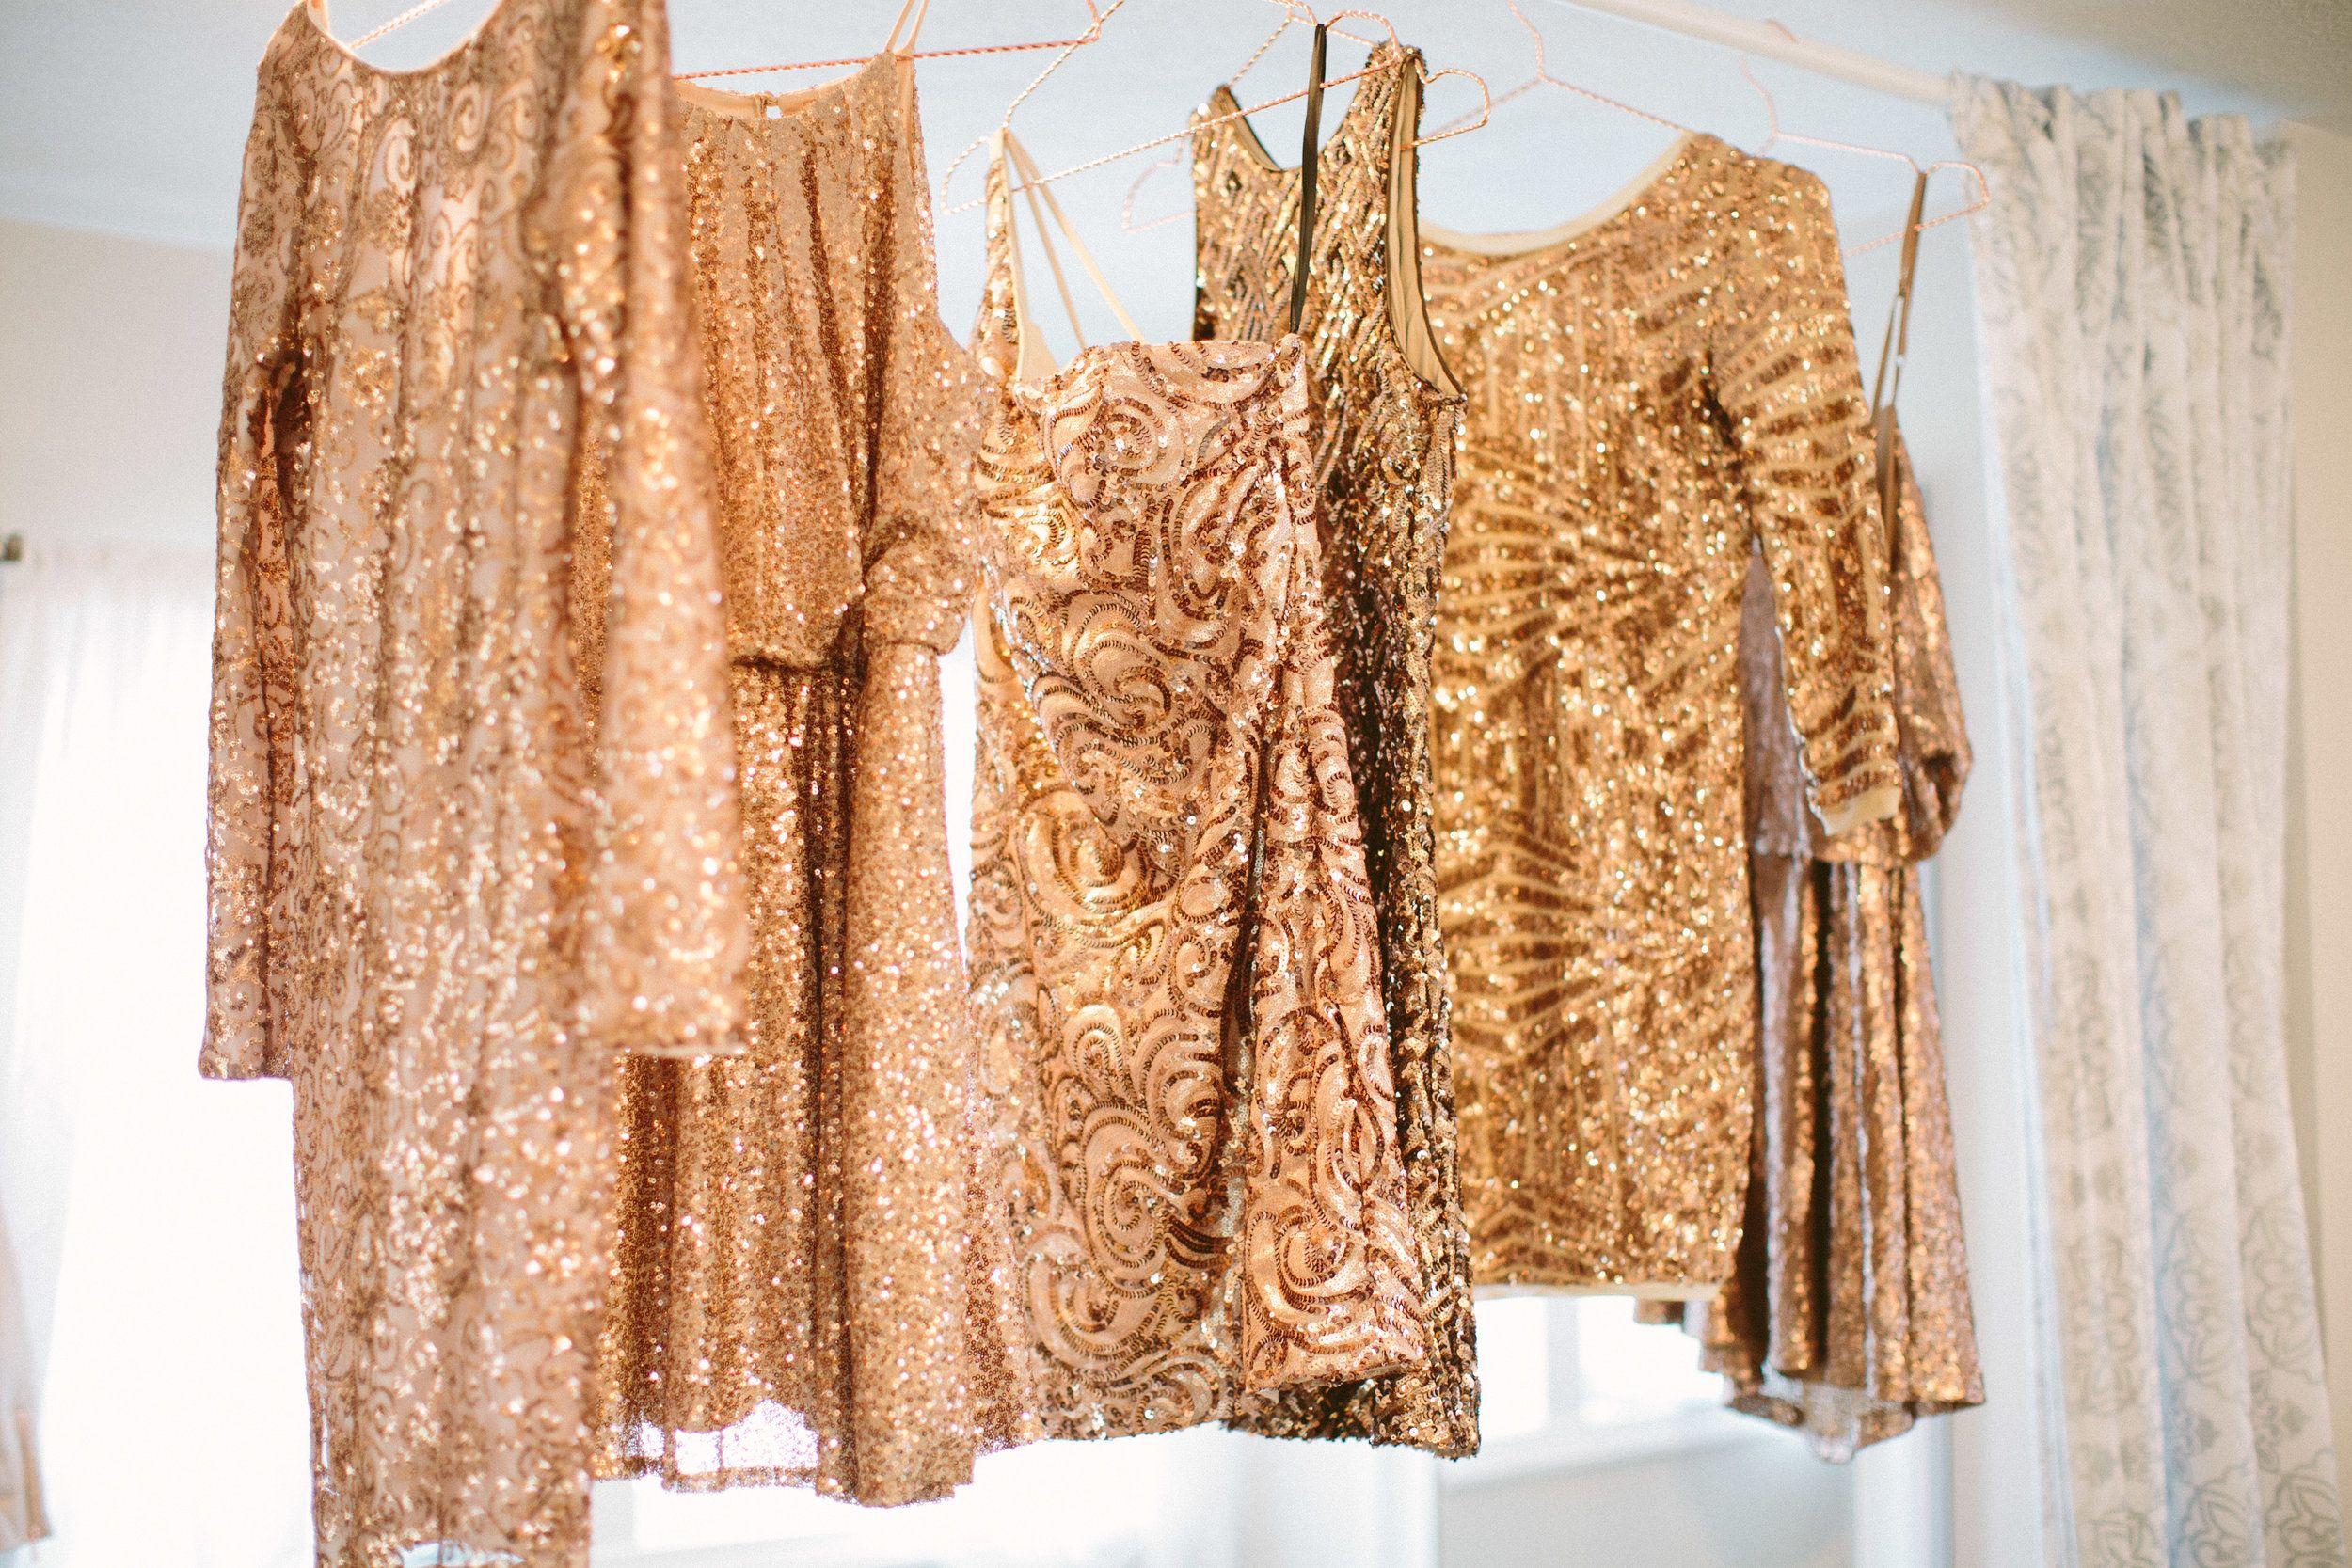 Copper bridesmaids dresses metallic bridesmaids dresses sequin copper bridesmaids dresses metallic bridesmaids dresses sequin bridesmaid dresses ombrellifo Choice Image